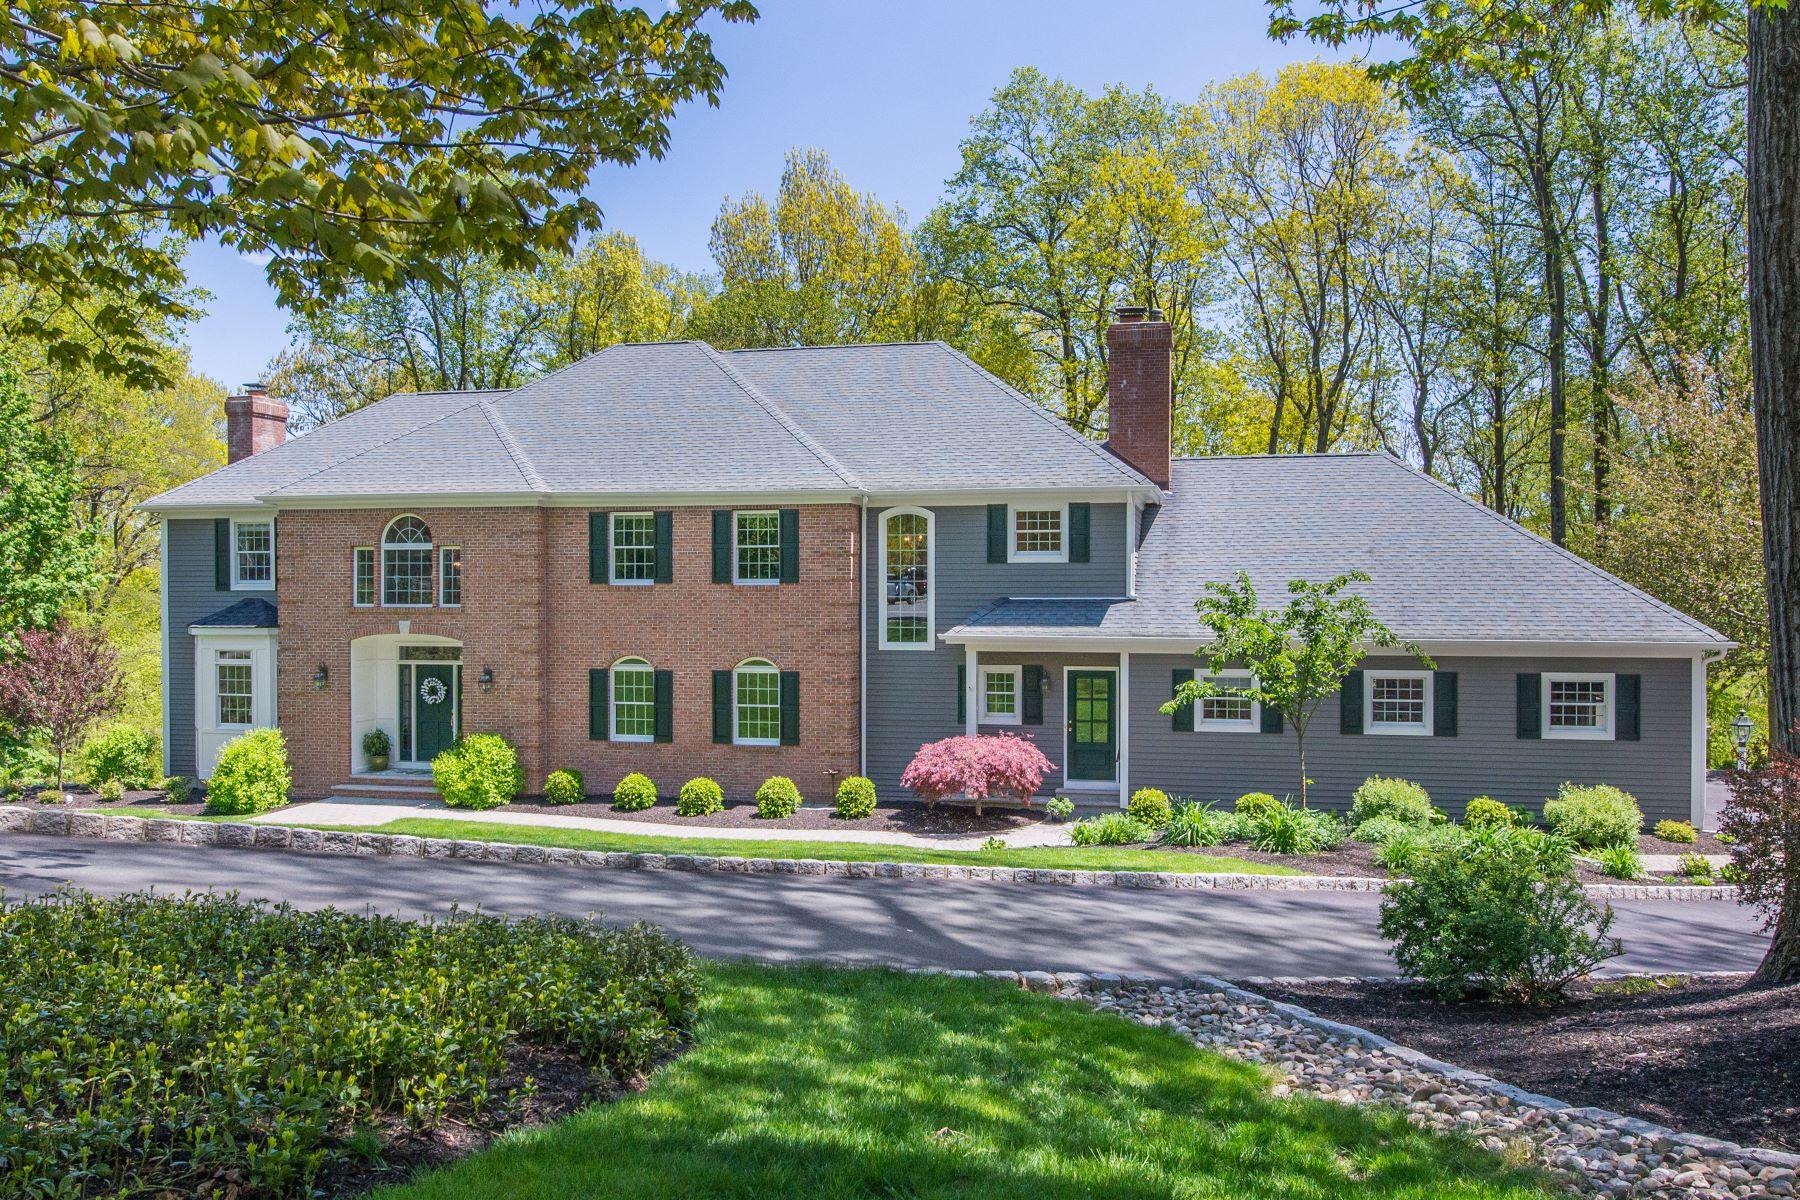 Single Family Homes için Satış at Gracious Colonial 10 Croydon Road, Morris Township, New Jersey 07960 Amerika Birleşik Devletleri